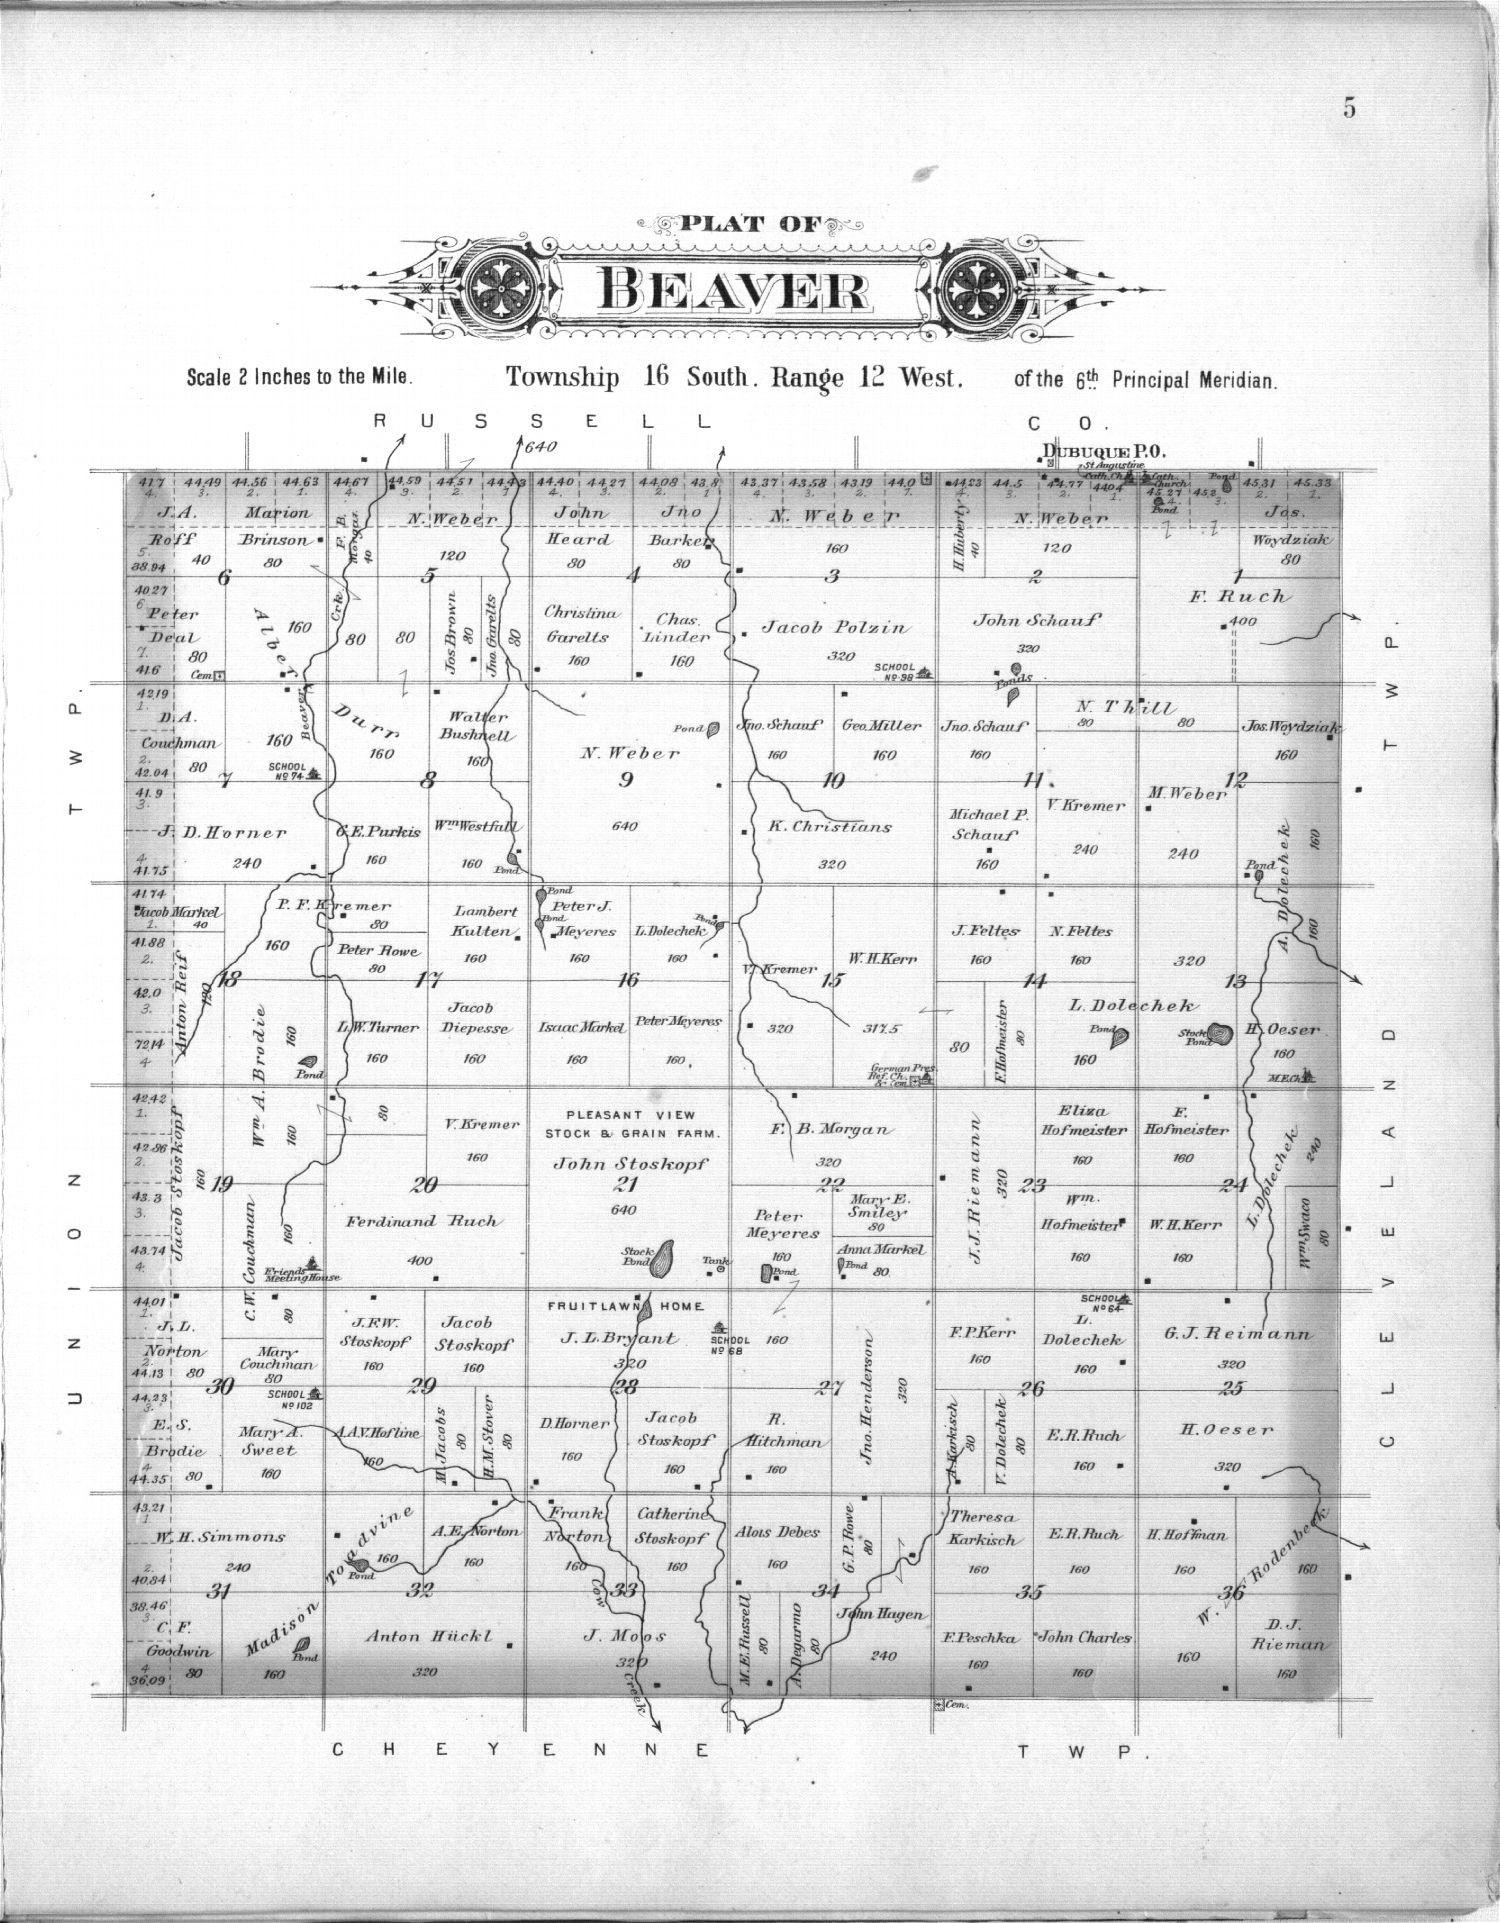 Plat book, Barton County, Kansas - 5